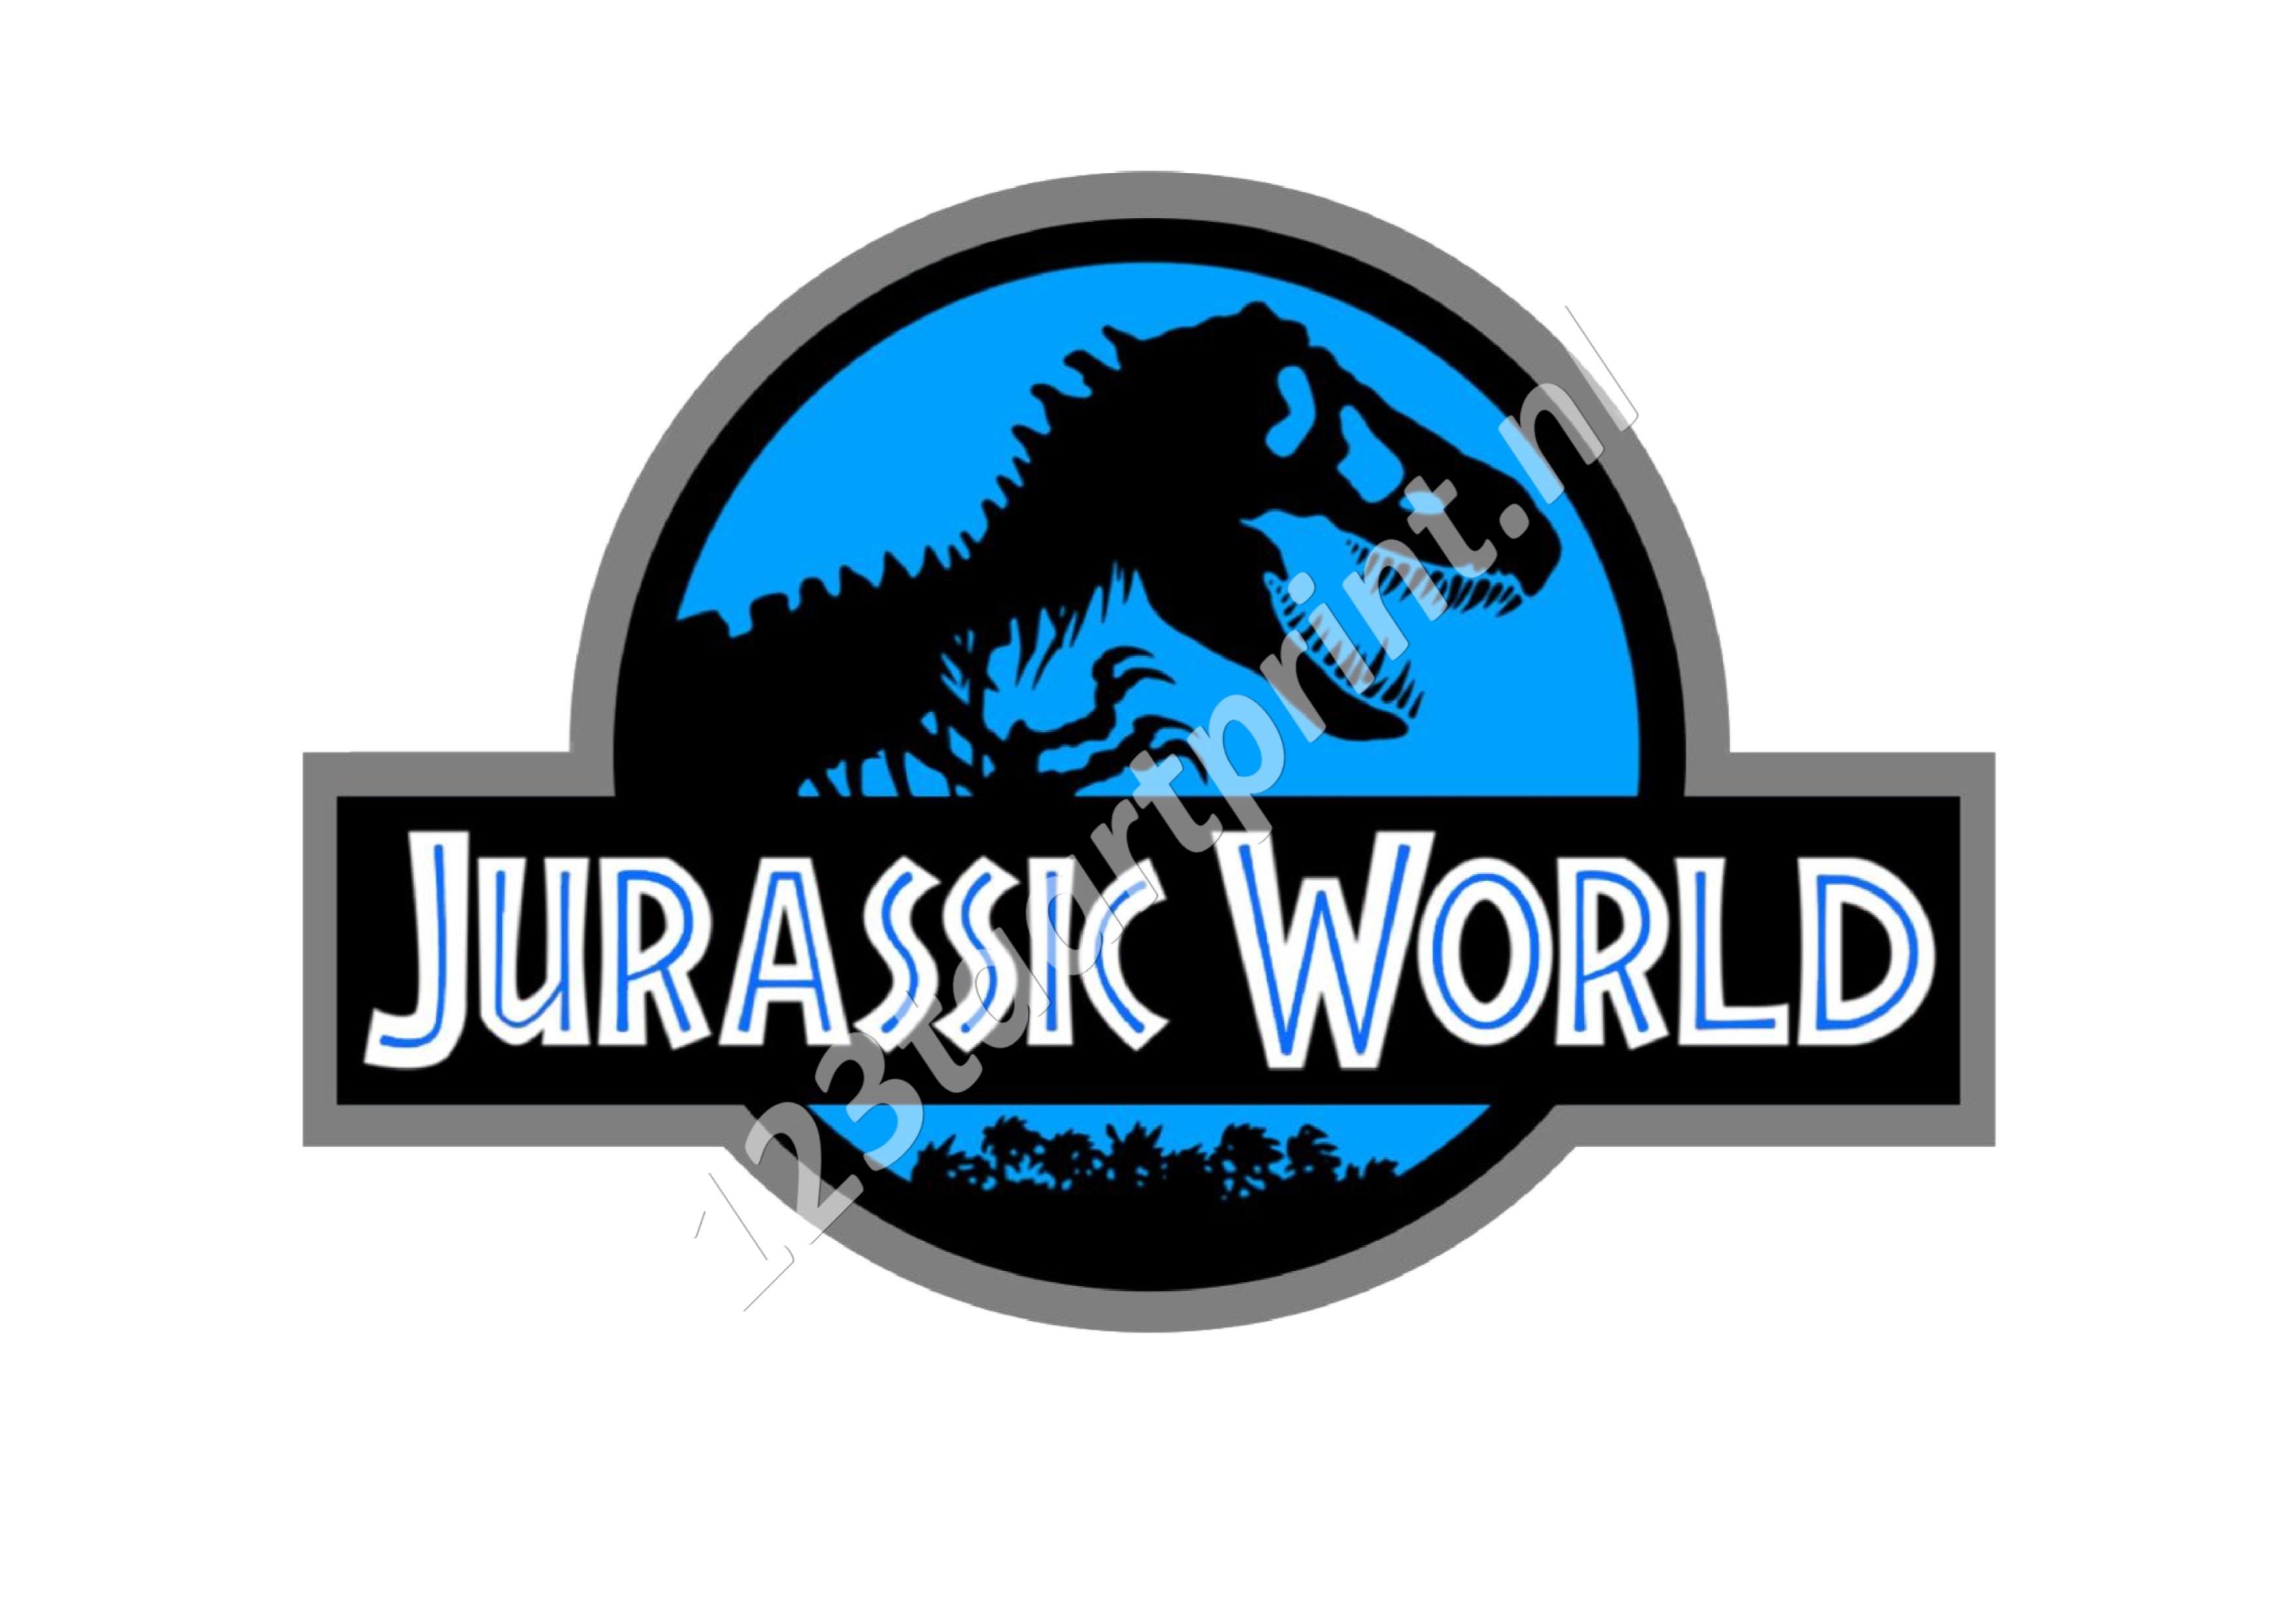 Jurassic World logo groot